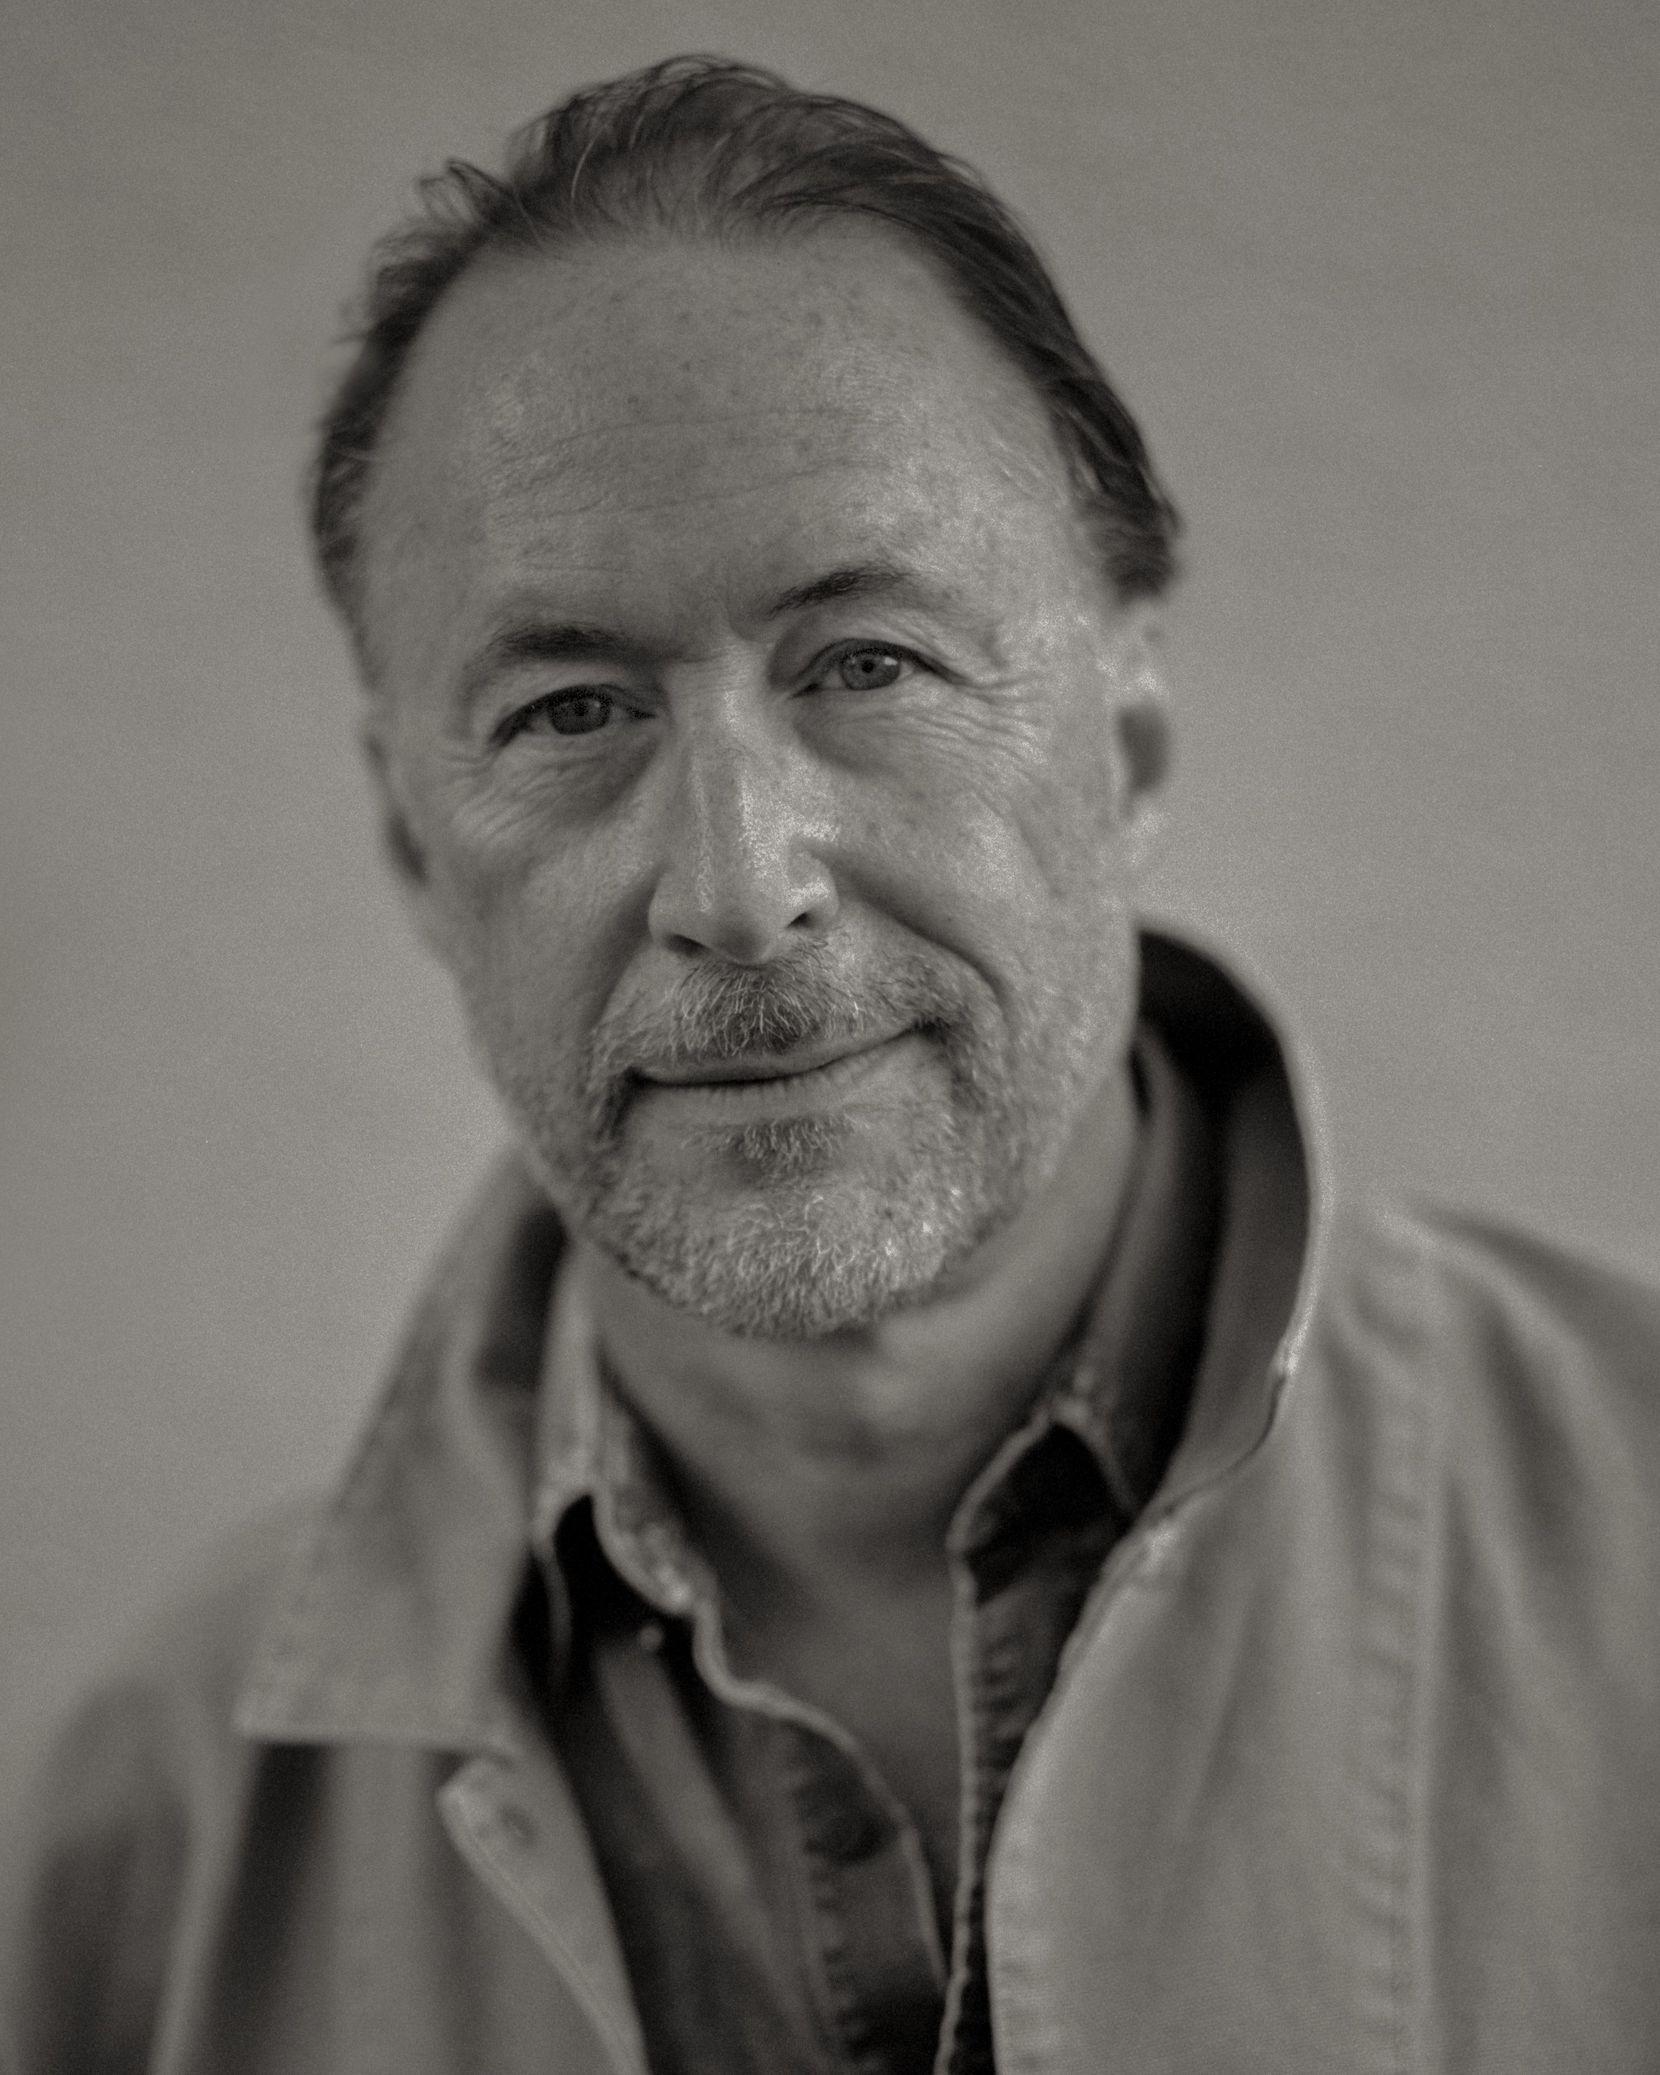 Hampton Sides, author of 'On Desperate Ground'